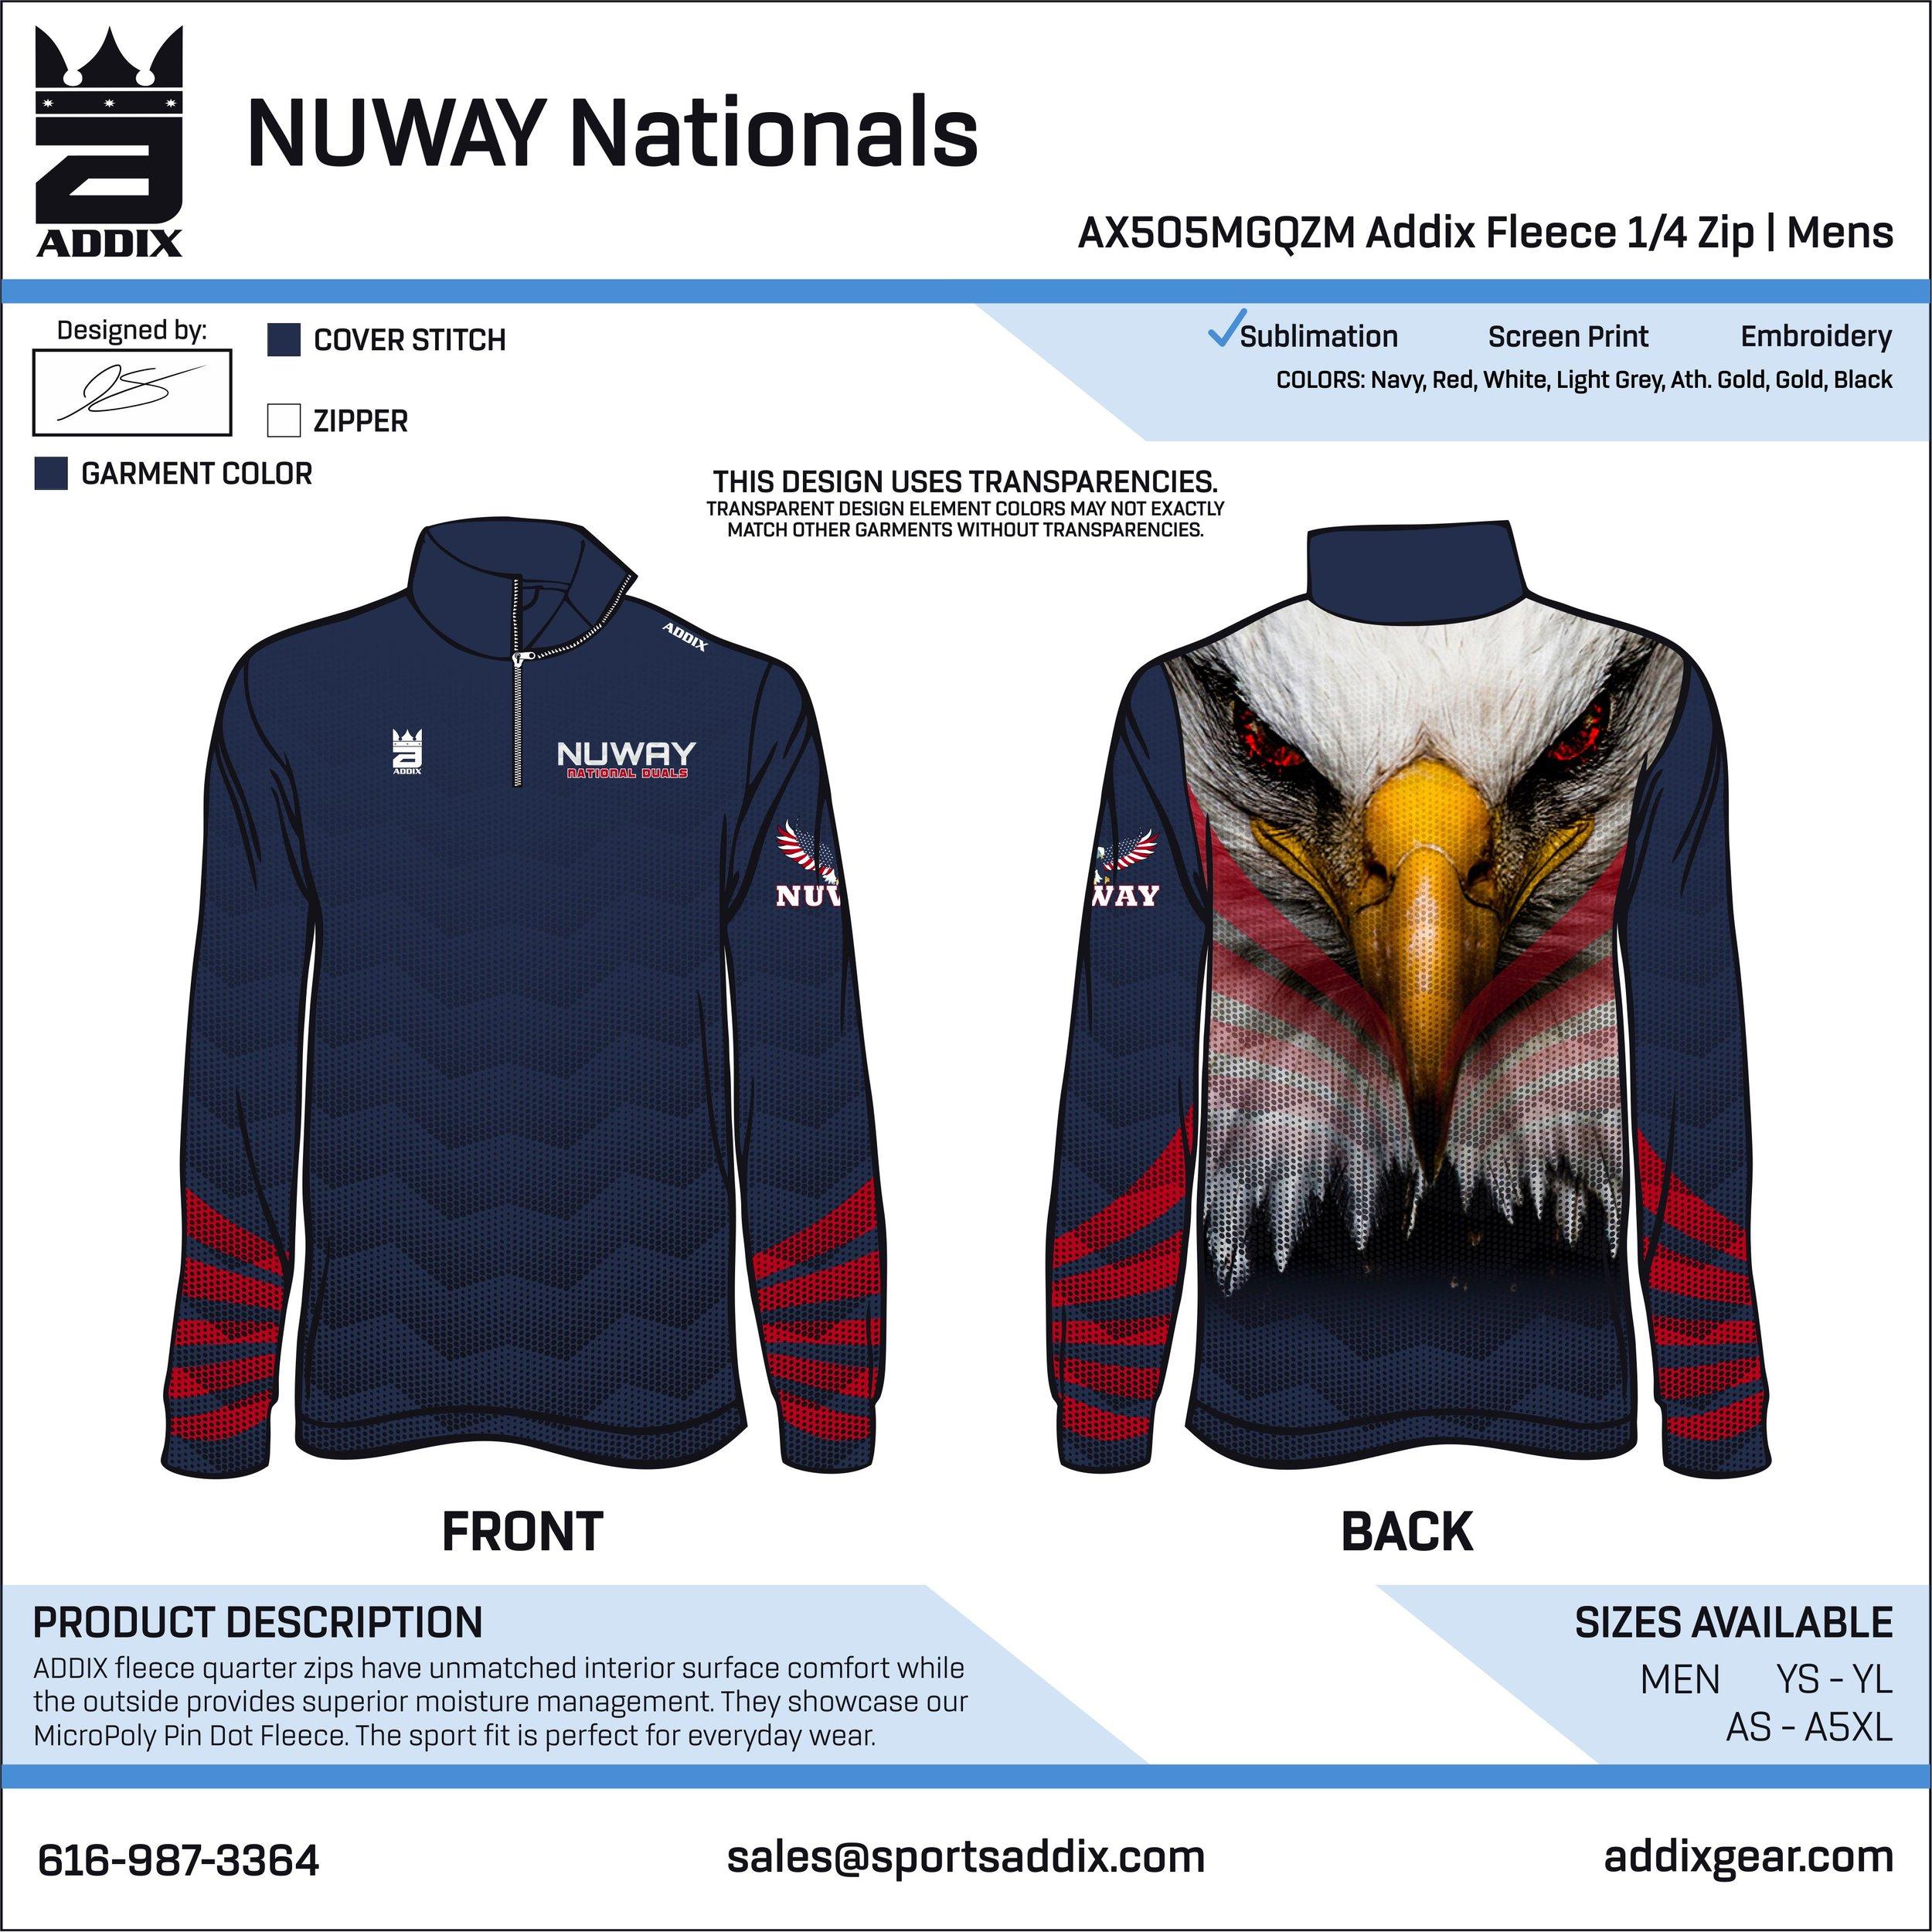 NUWAY Nationals_2018_11-16_JE_QZ Full Sub.jpg